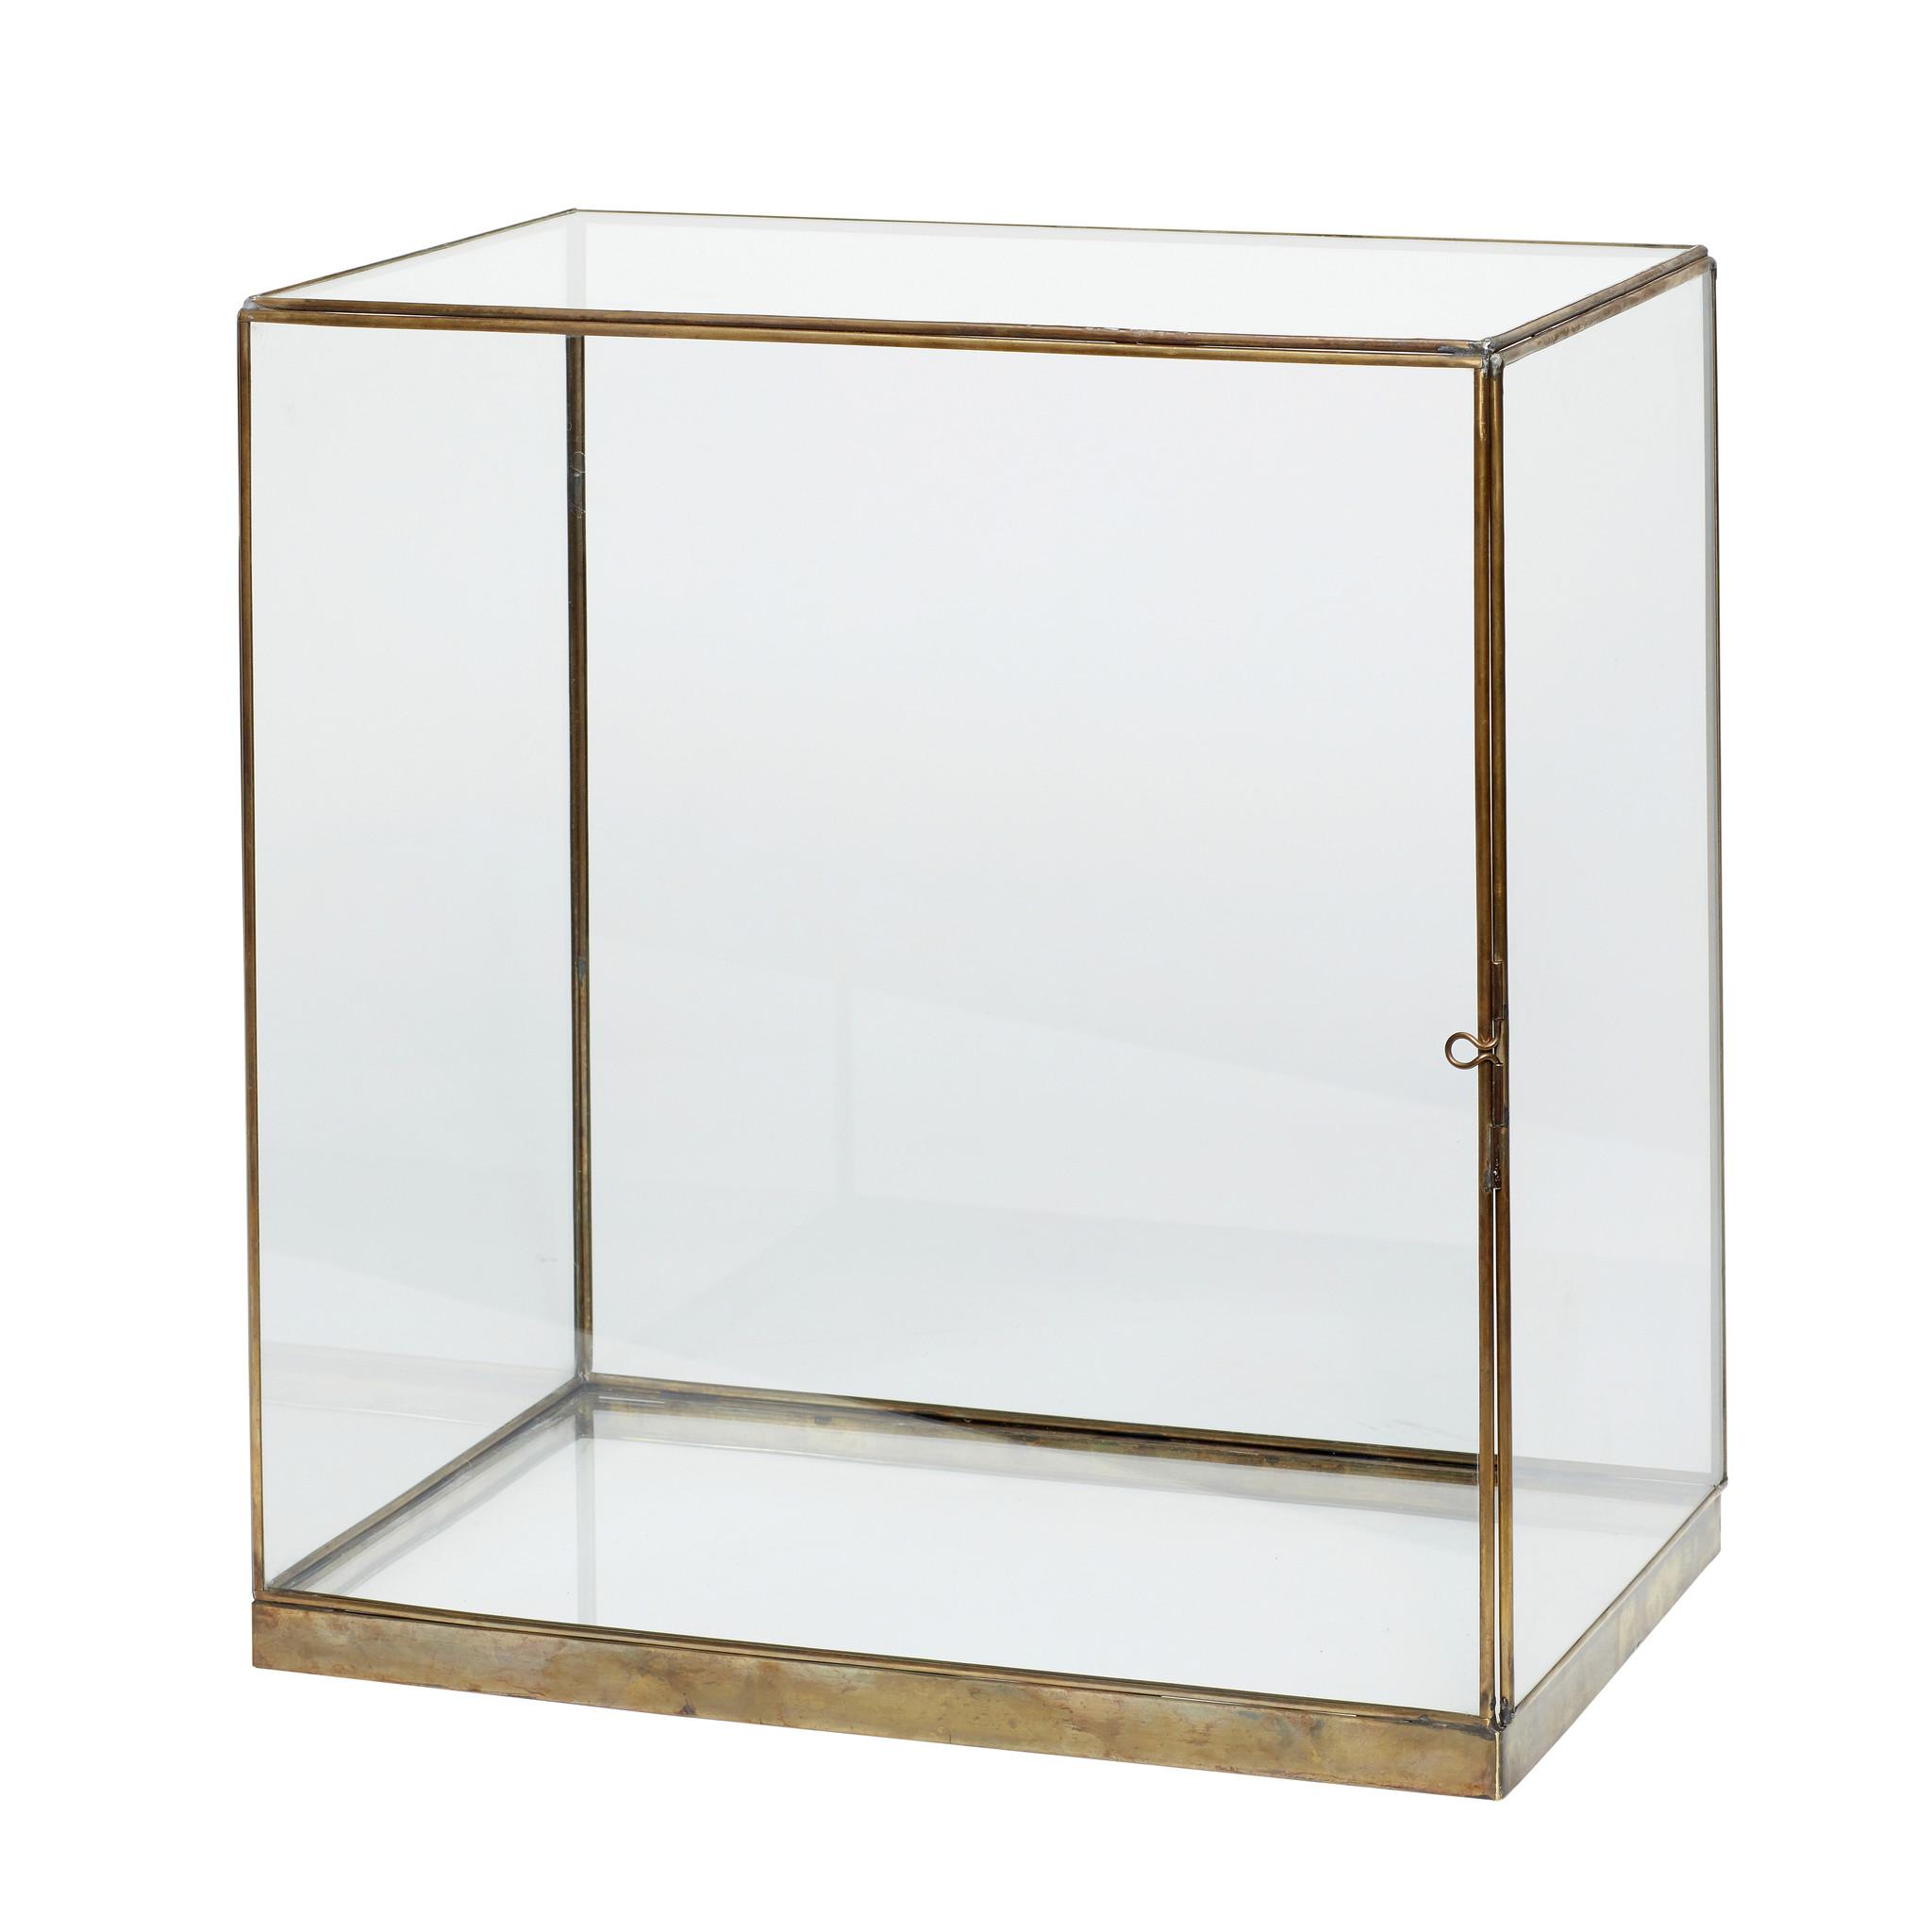 Hubsch Display, messing / glas, groot-310204-5712772065464